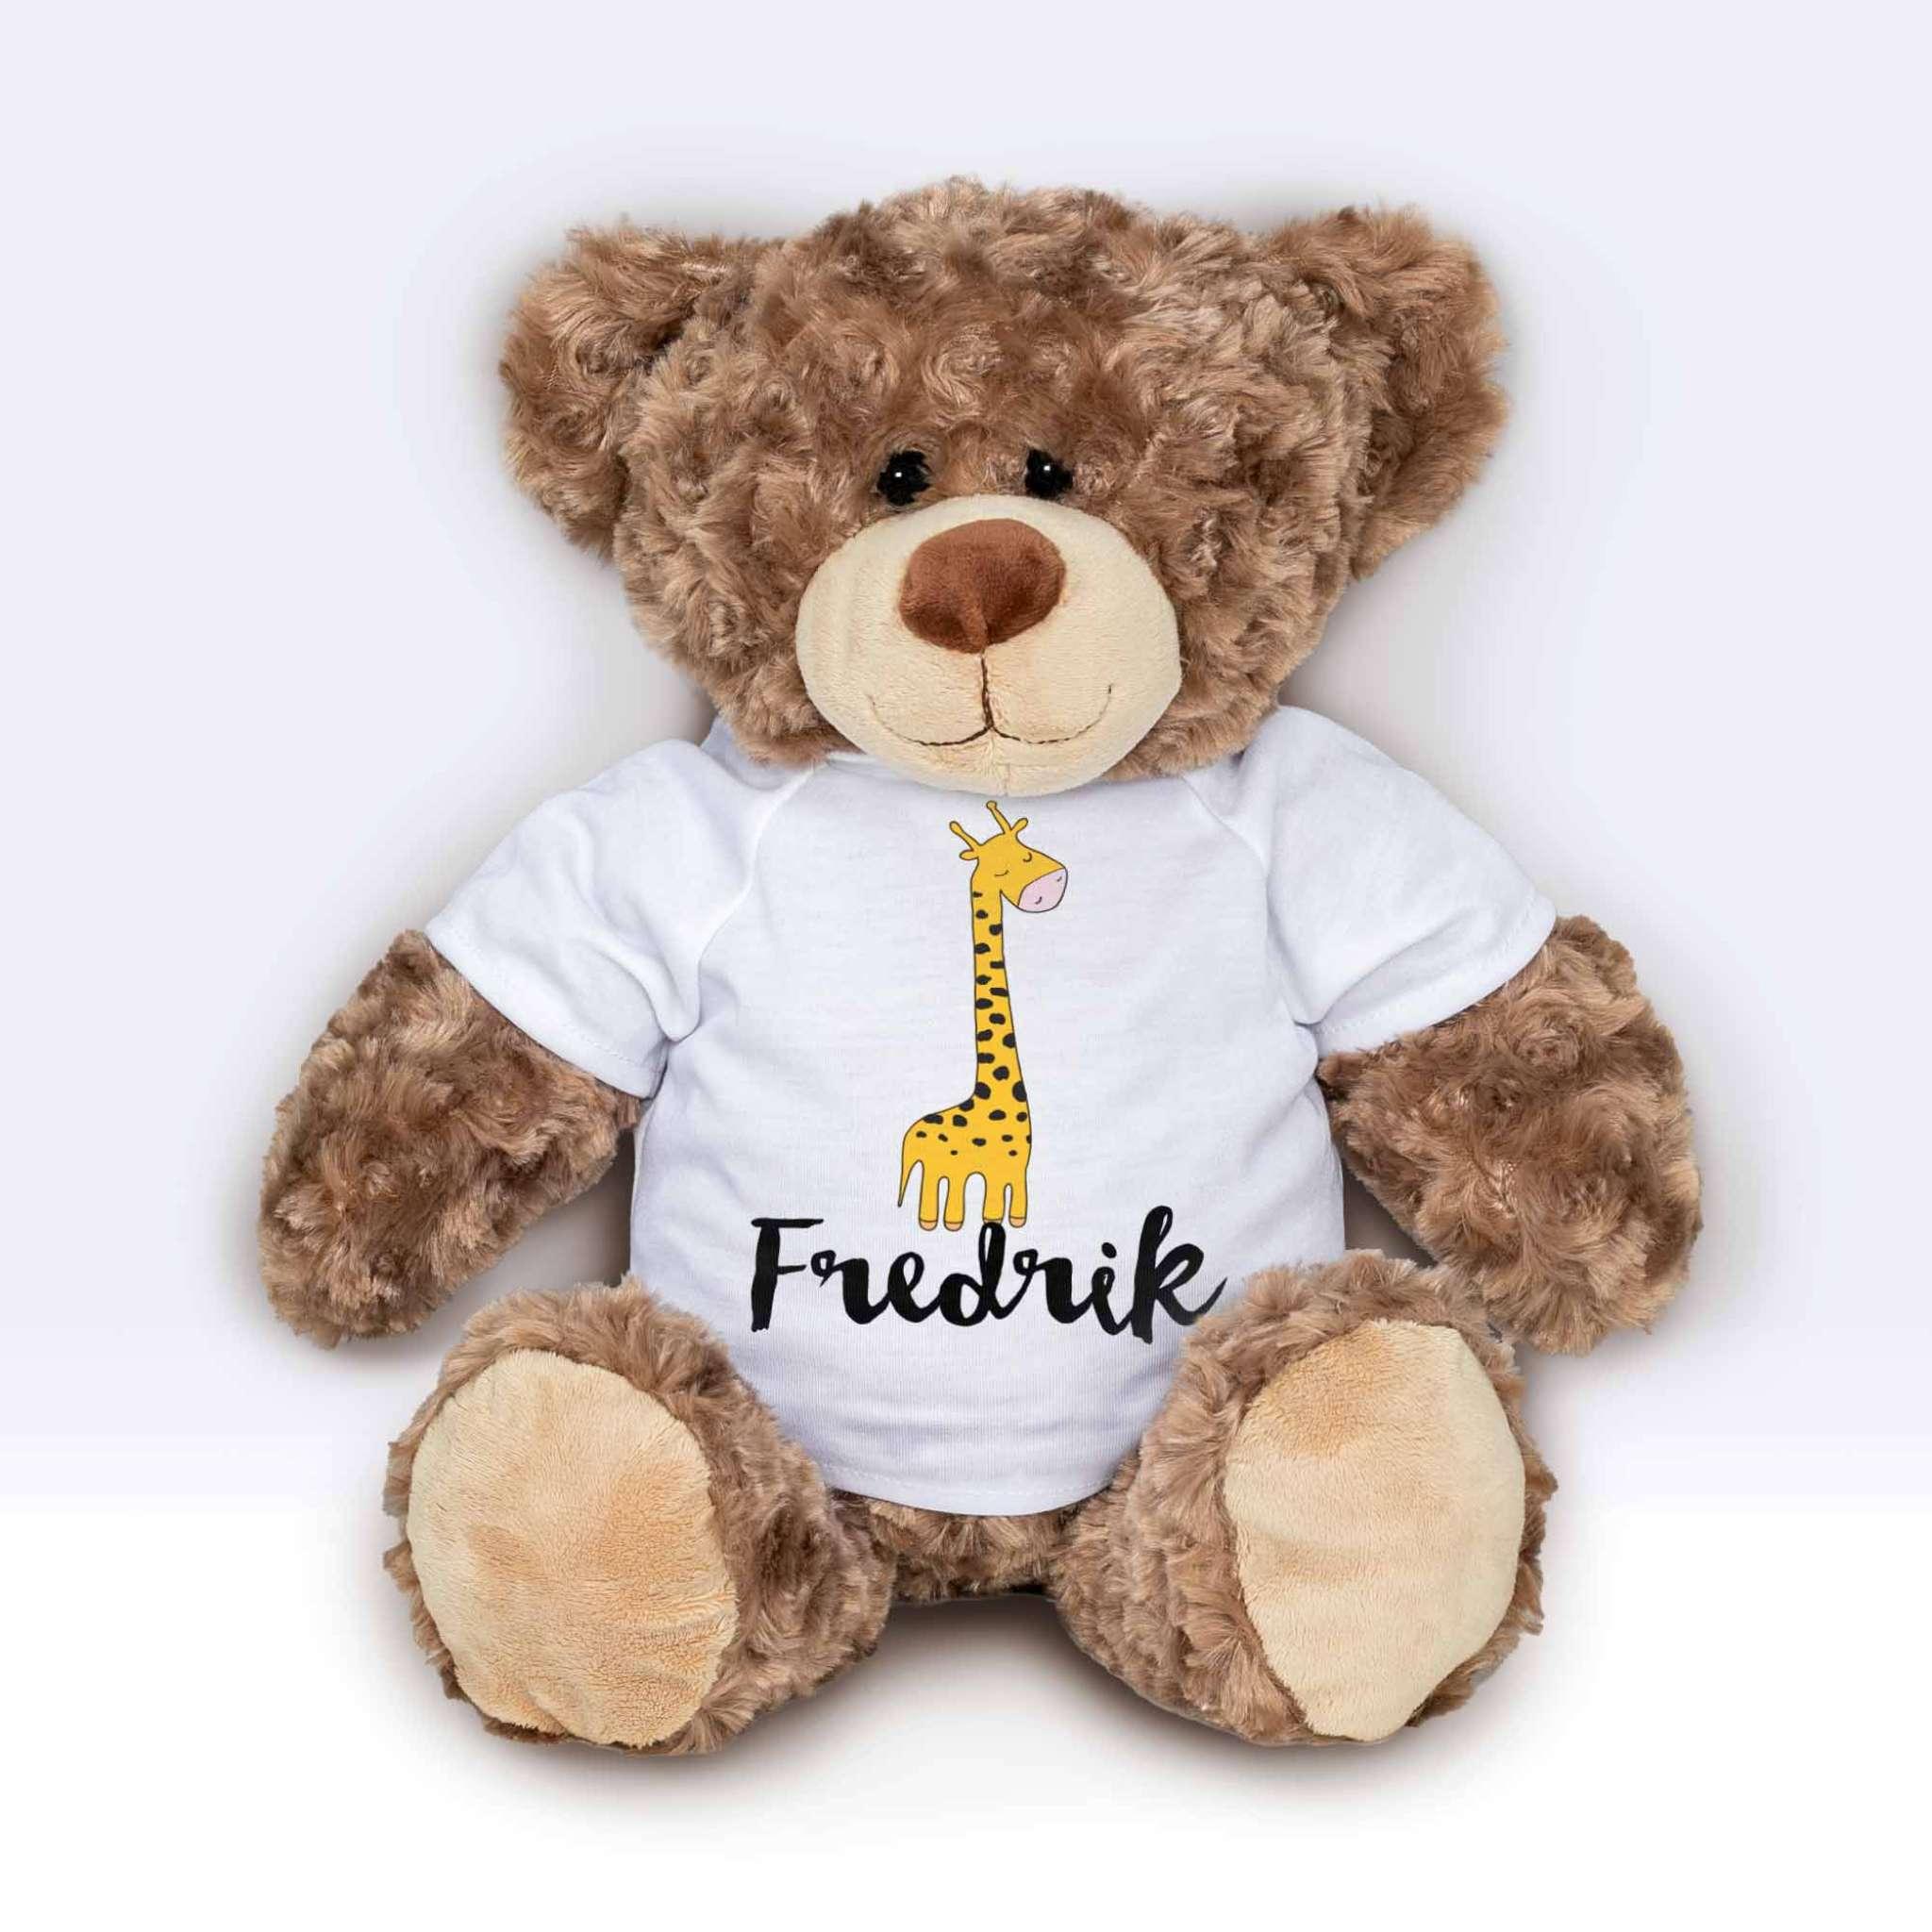 Teddy T-shirt Giraff